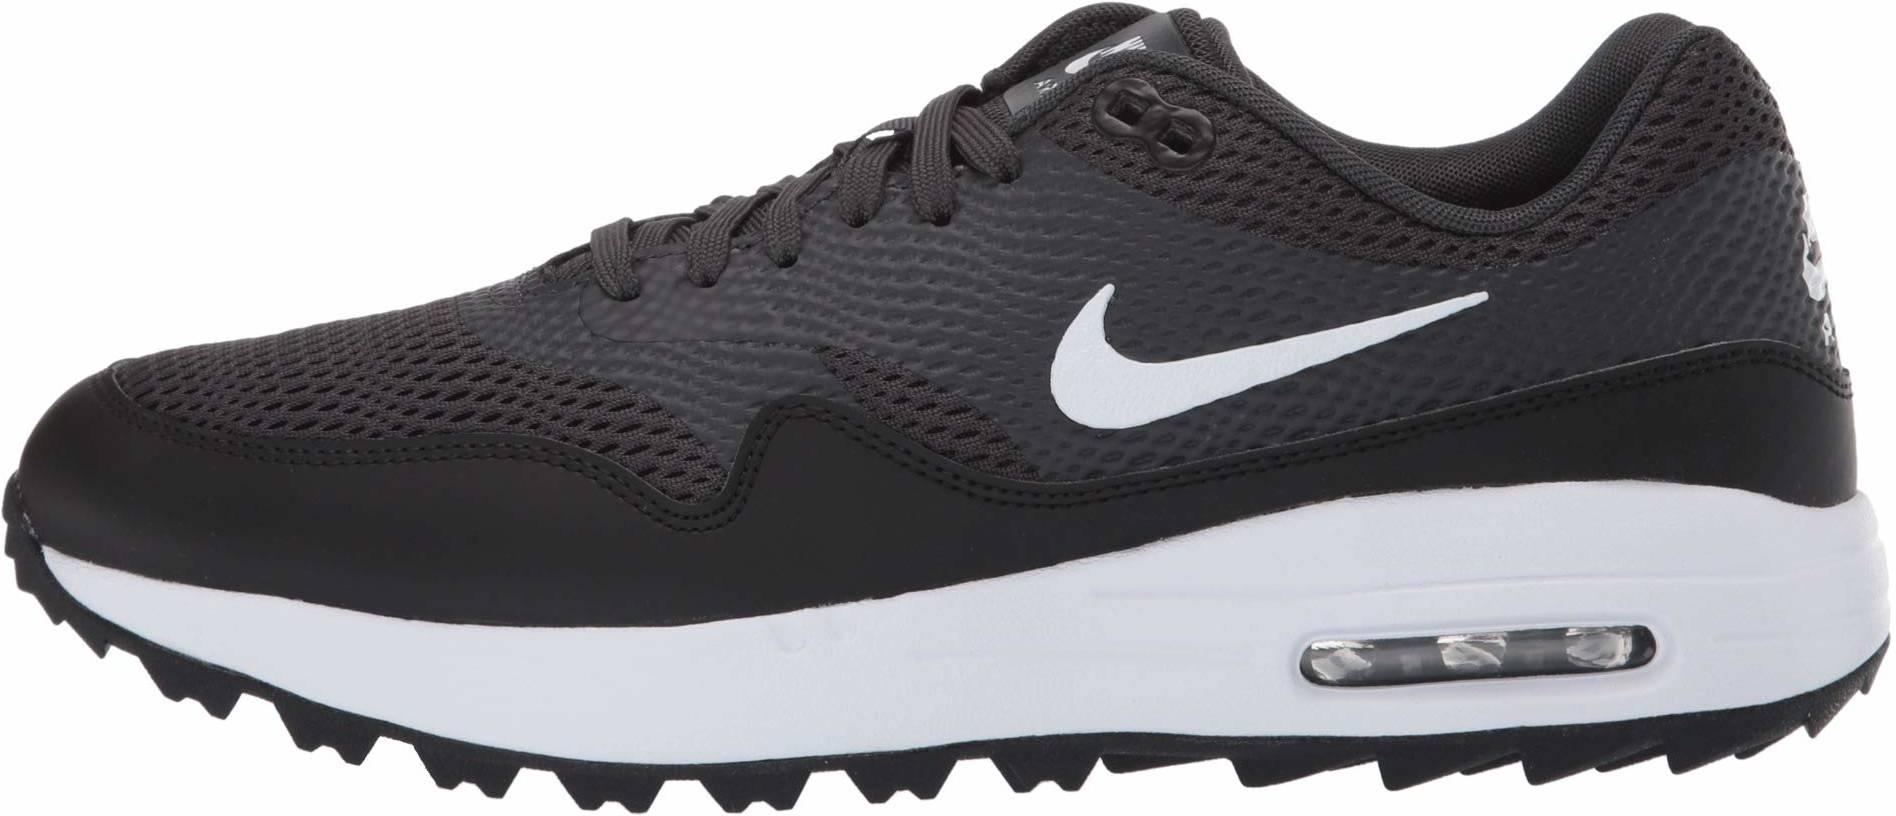 Nike Air Max 1 G - Deals ($90), Facts, Reviews (2021) | RunRepeat